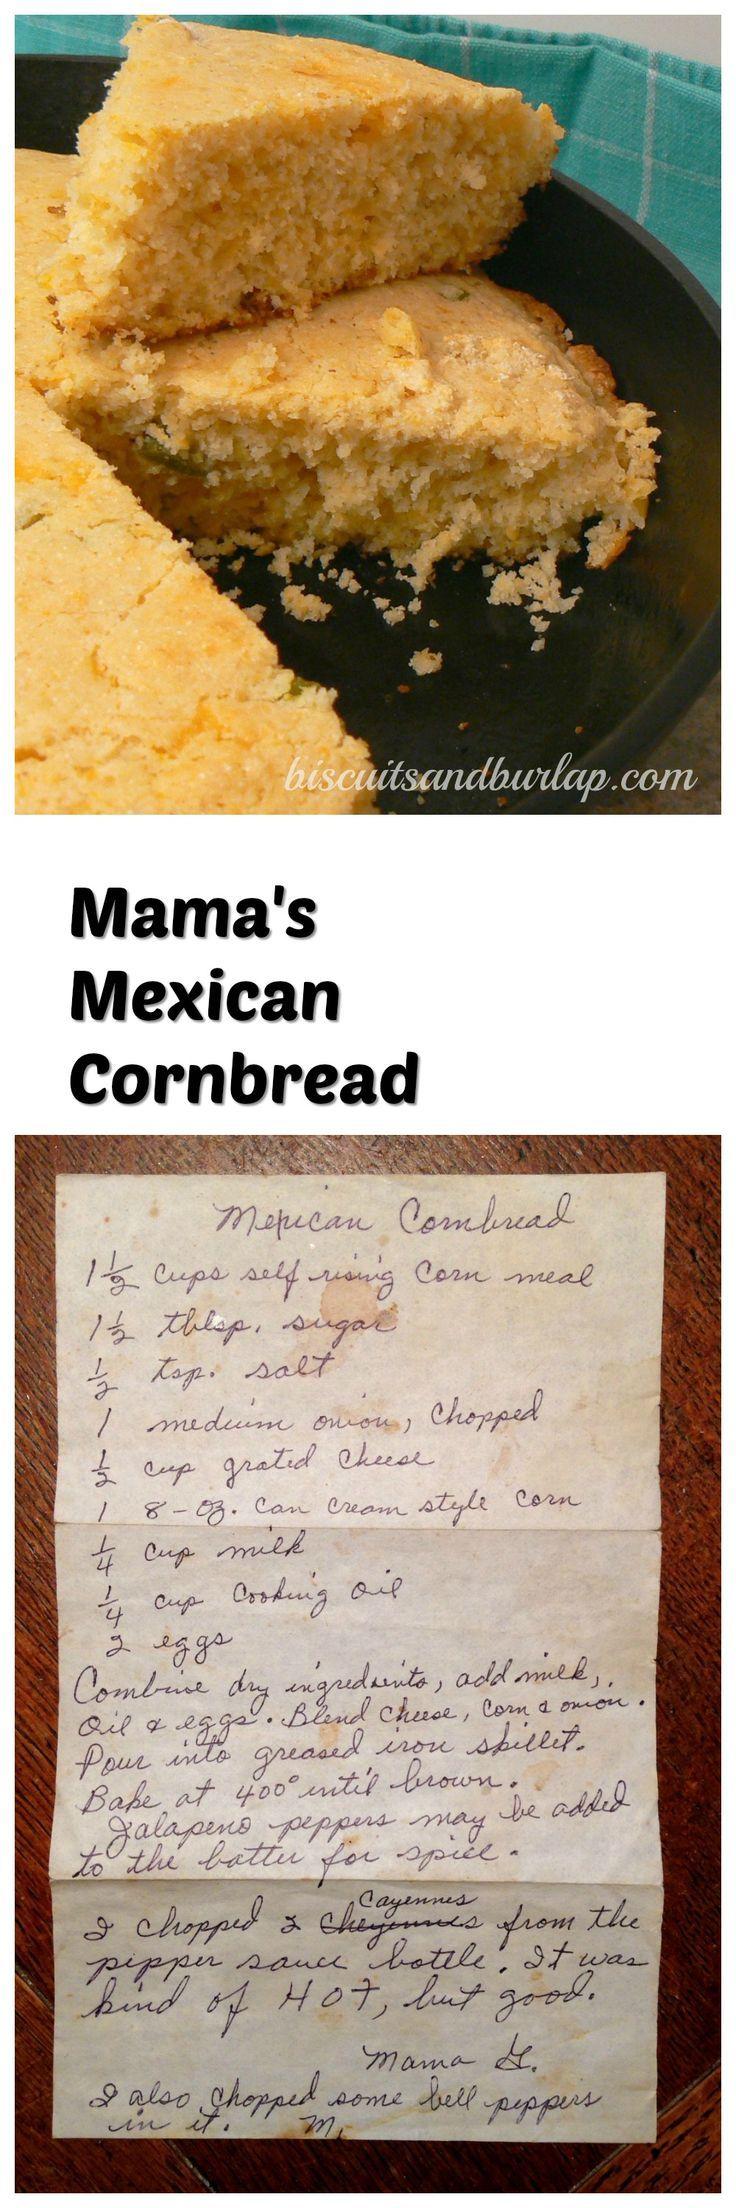 Mama's Mexican Cornbread (Baking Salmon Treats)